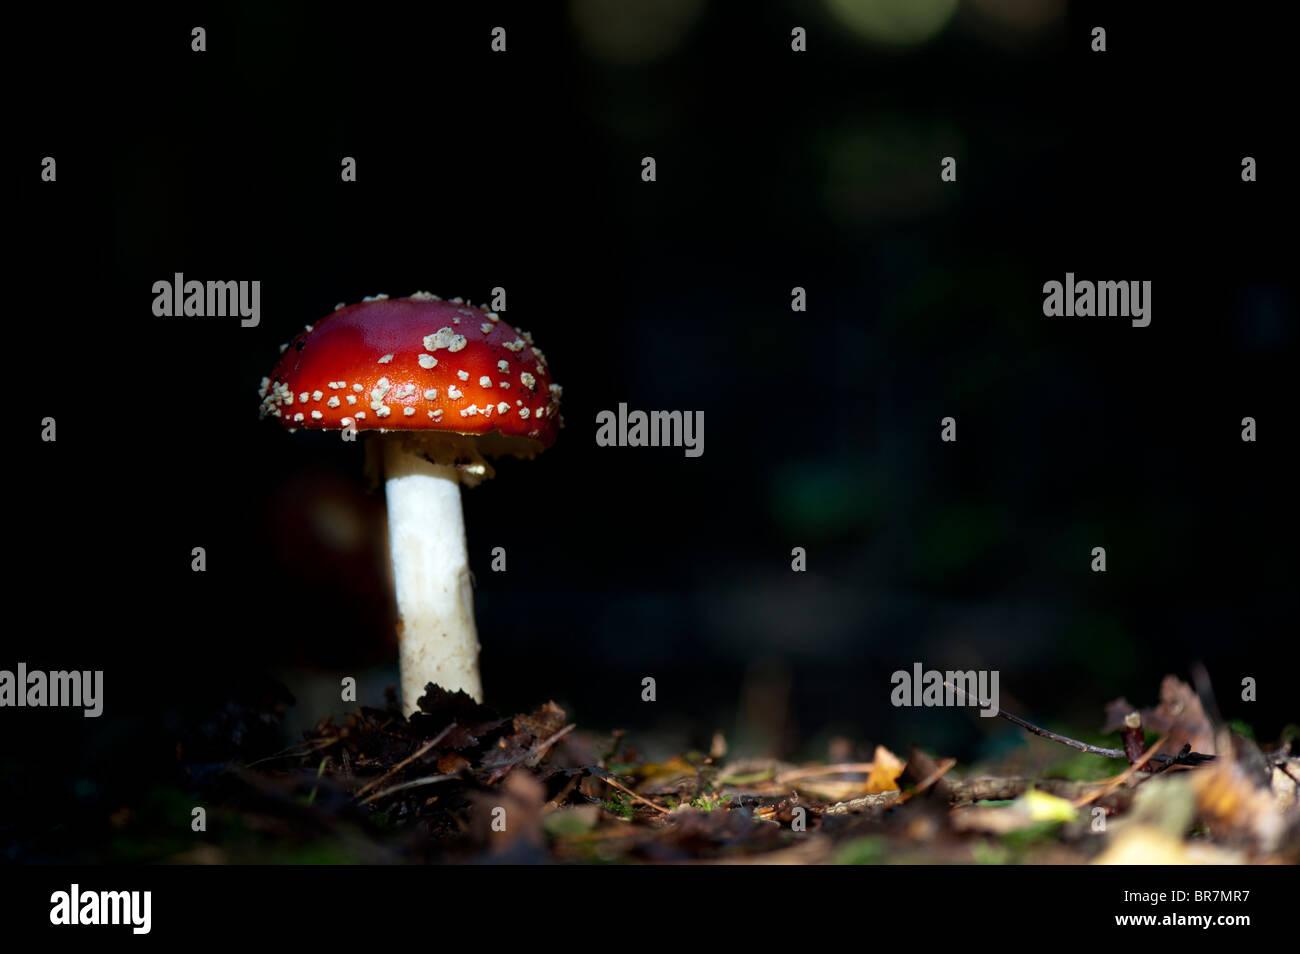 Amanita muscaria, Fly agaric mushroom in an english woodland. Stock Photo